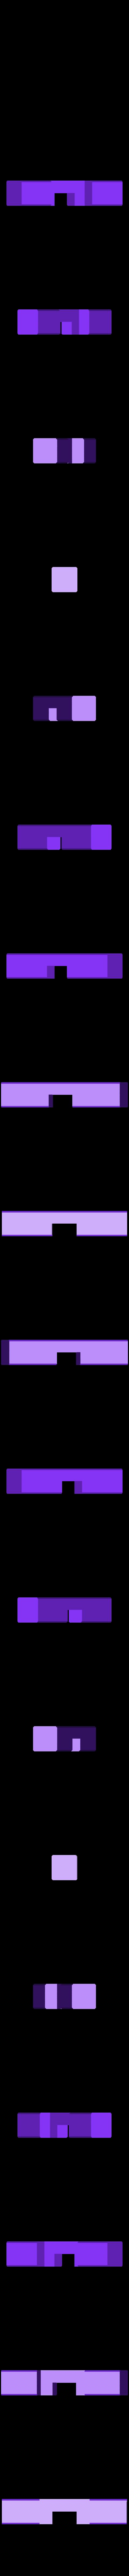 A.stl Download free STL file Mini Puzzle Puzzle • 3D printer model, Bdz37